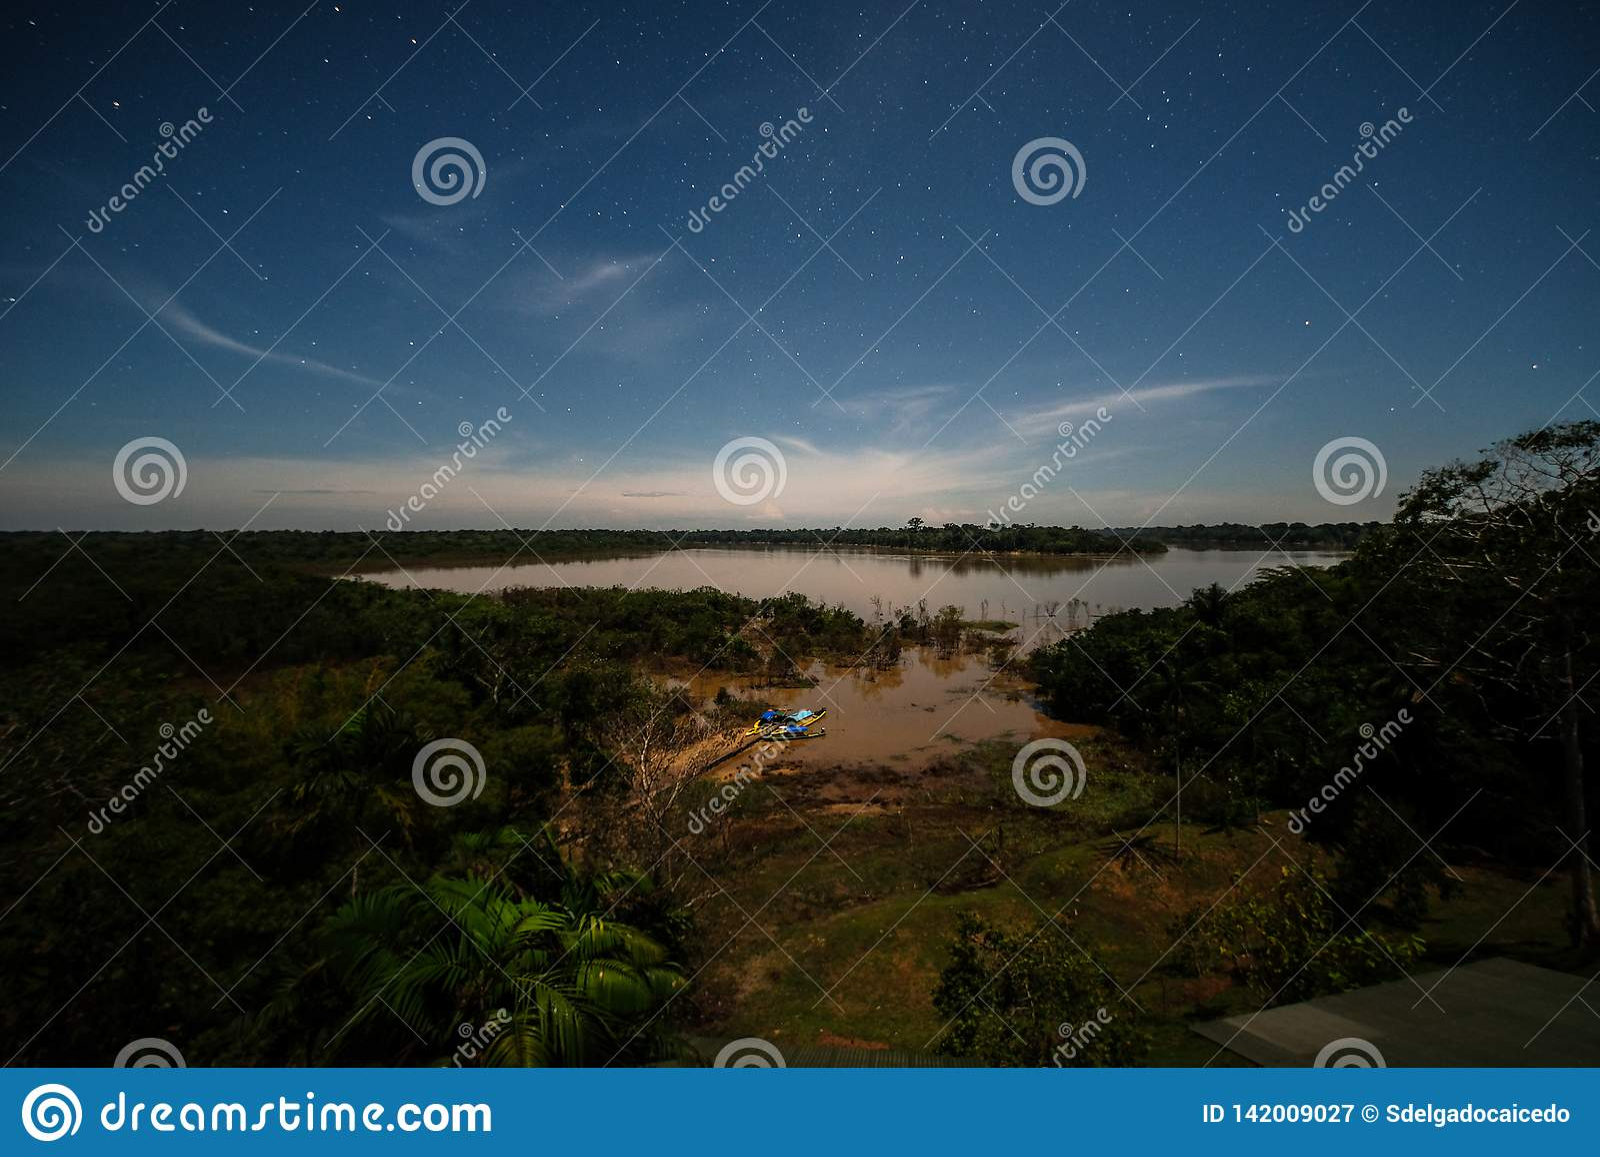 A night full of stars in the Brazilian Amazon